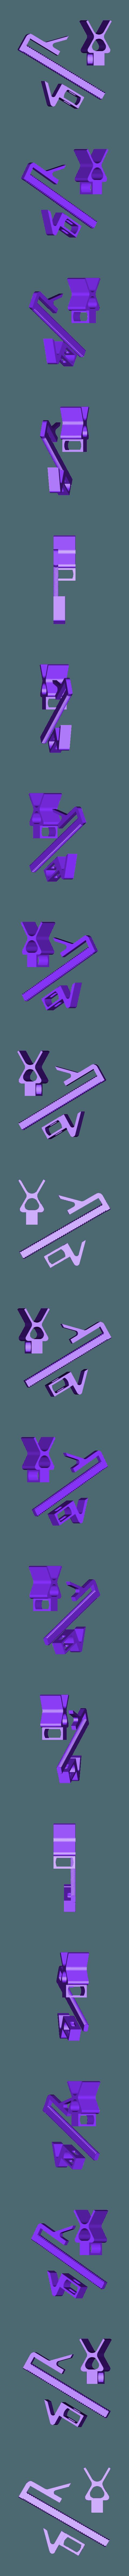 All(without-nuts).stl Download free STL file Universal Adapter Smartphone-Binoculars • 3D printer design, Matlek